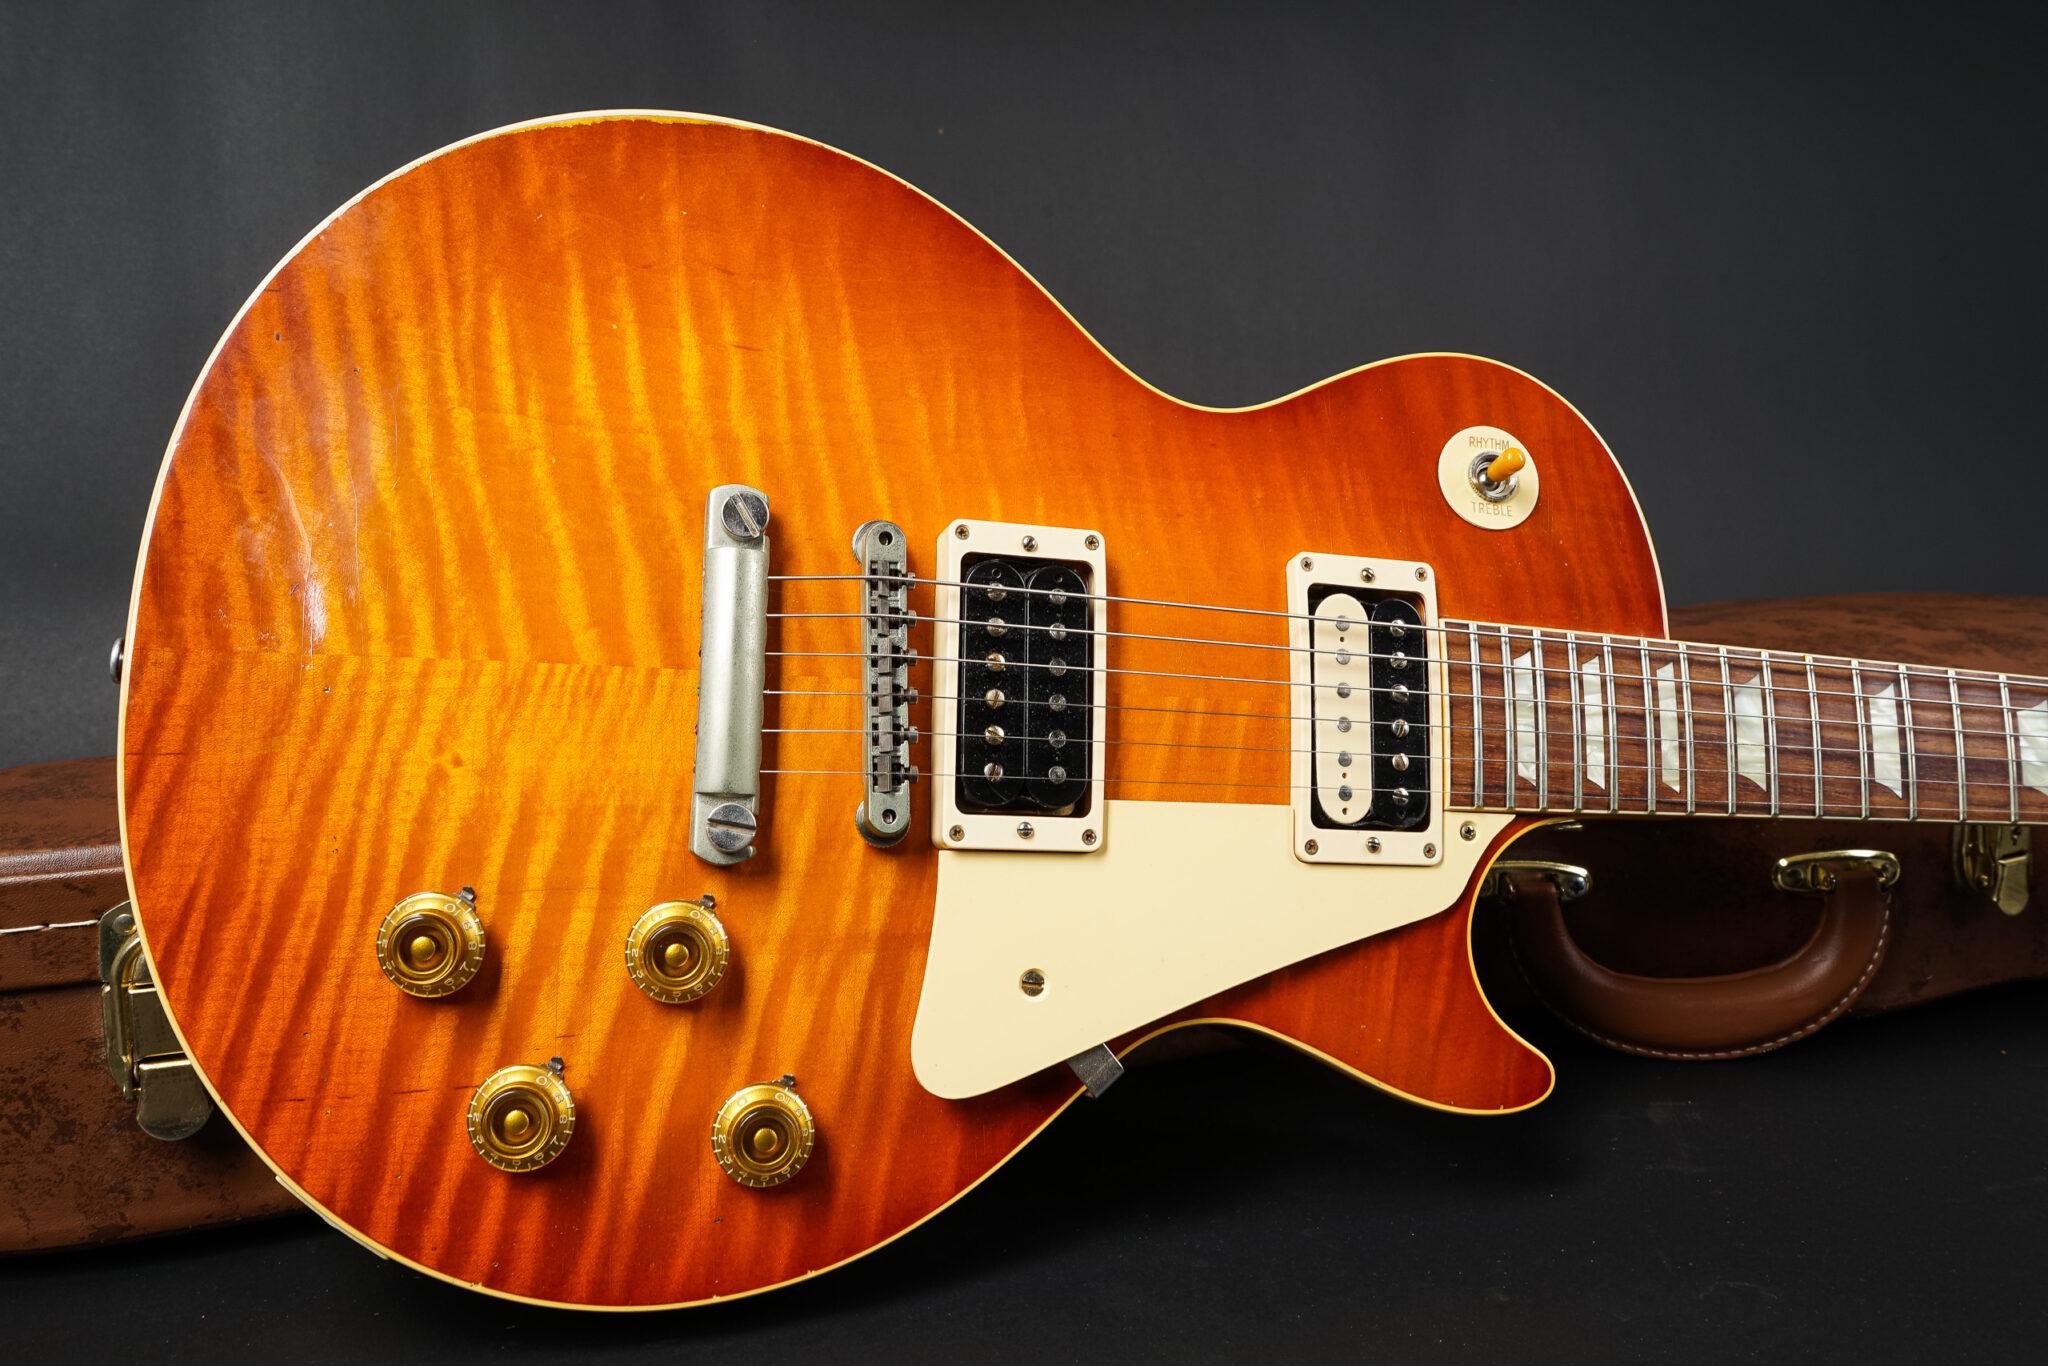 https://guitarpoint.de/app/uploads/products/2015-gibson-les-paul-hs9-aged-hs9-50339/2015-Gibson-Historic-Select-1959-Les-Paul-Aged-HS50339-8-2048x1366.jpg